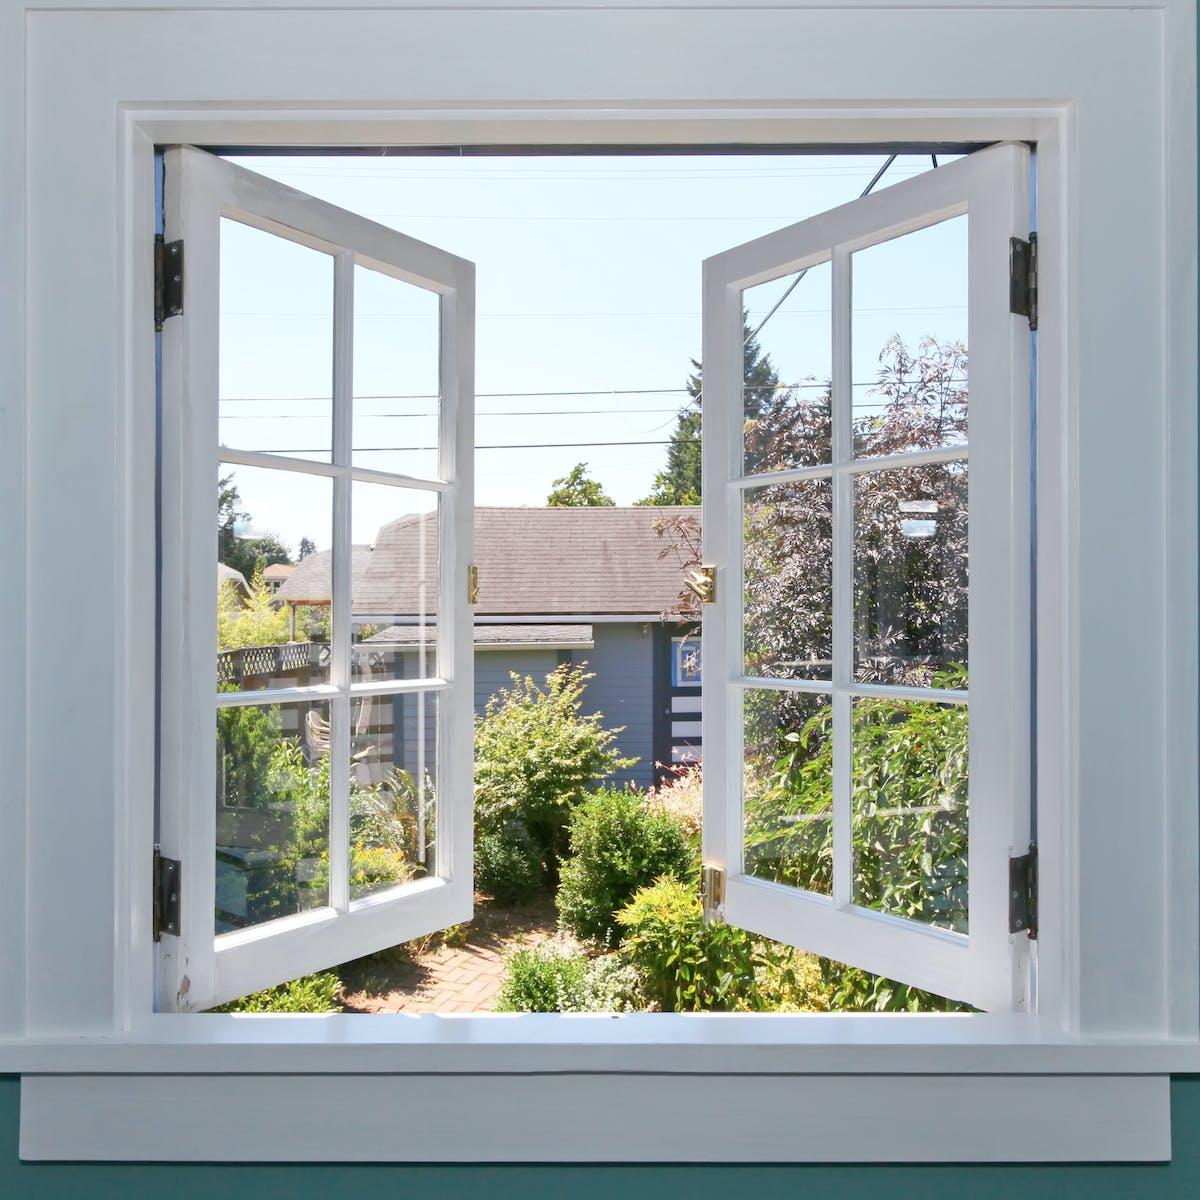 Open windows to help stop the spread of coronavirus, advises architectural  engineer